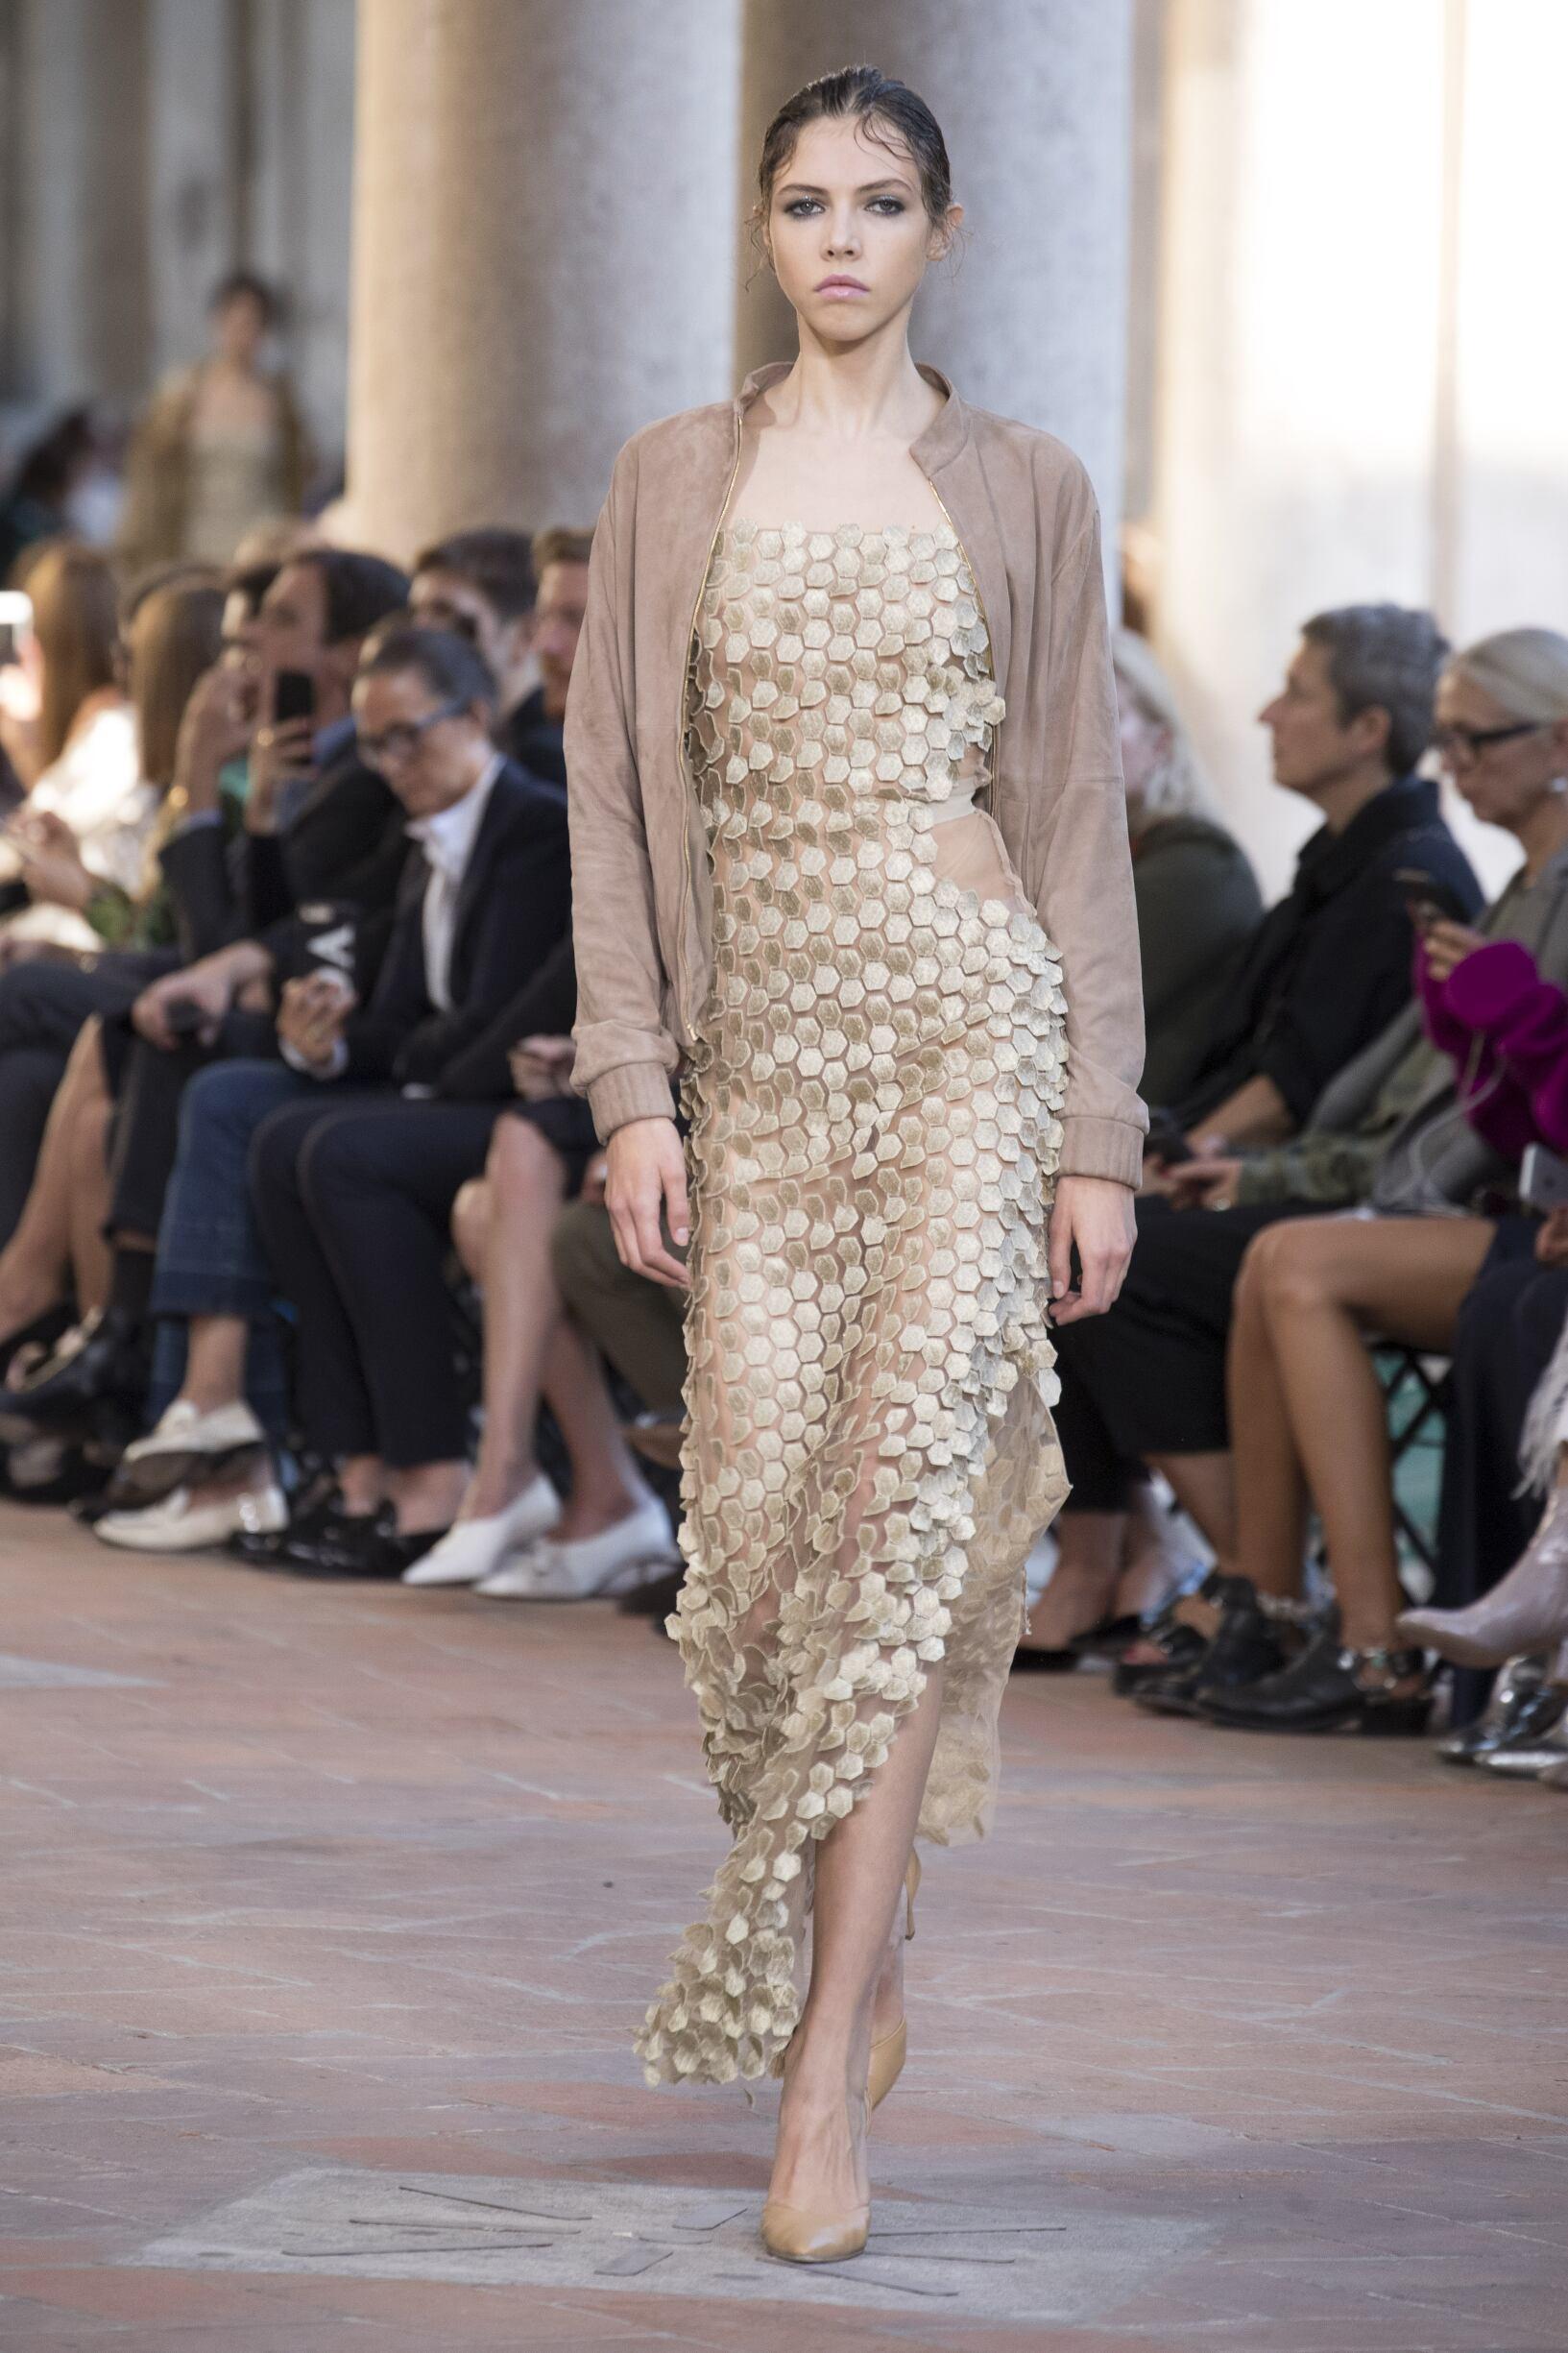 Catwalk Alberta Ferretti Woman Fashion Show Summer 2018